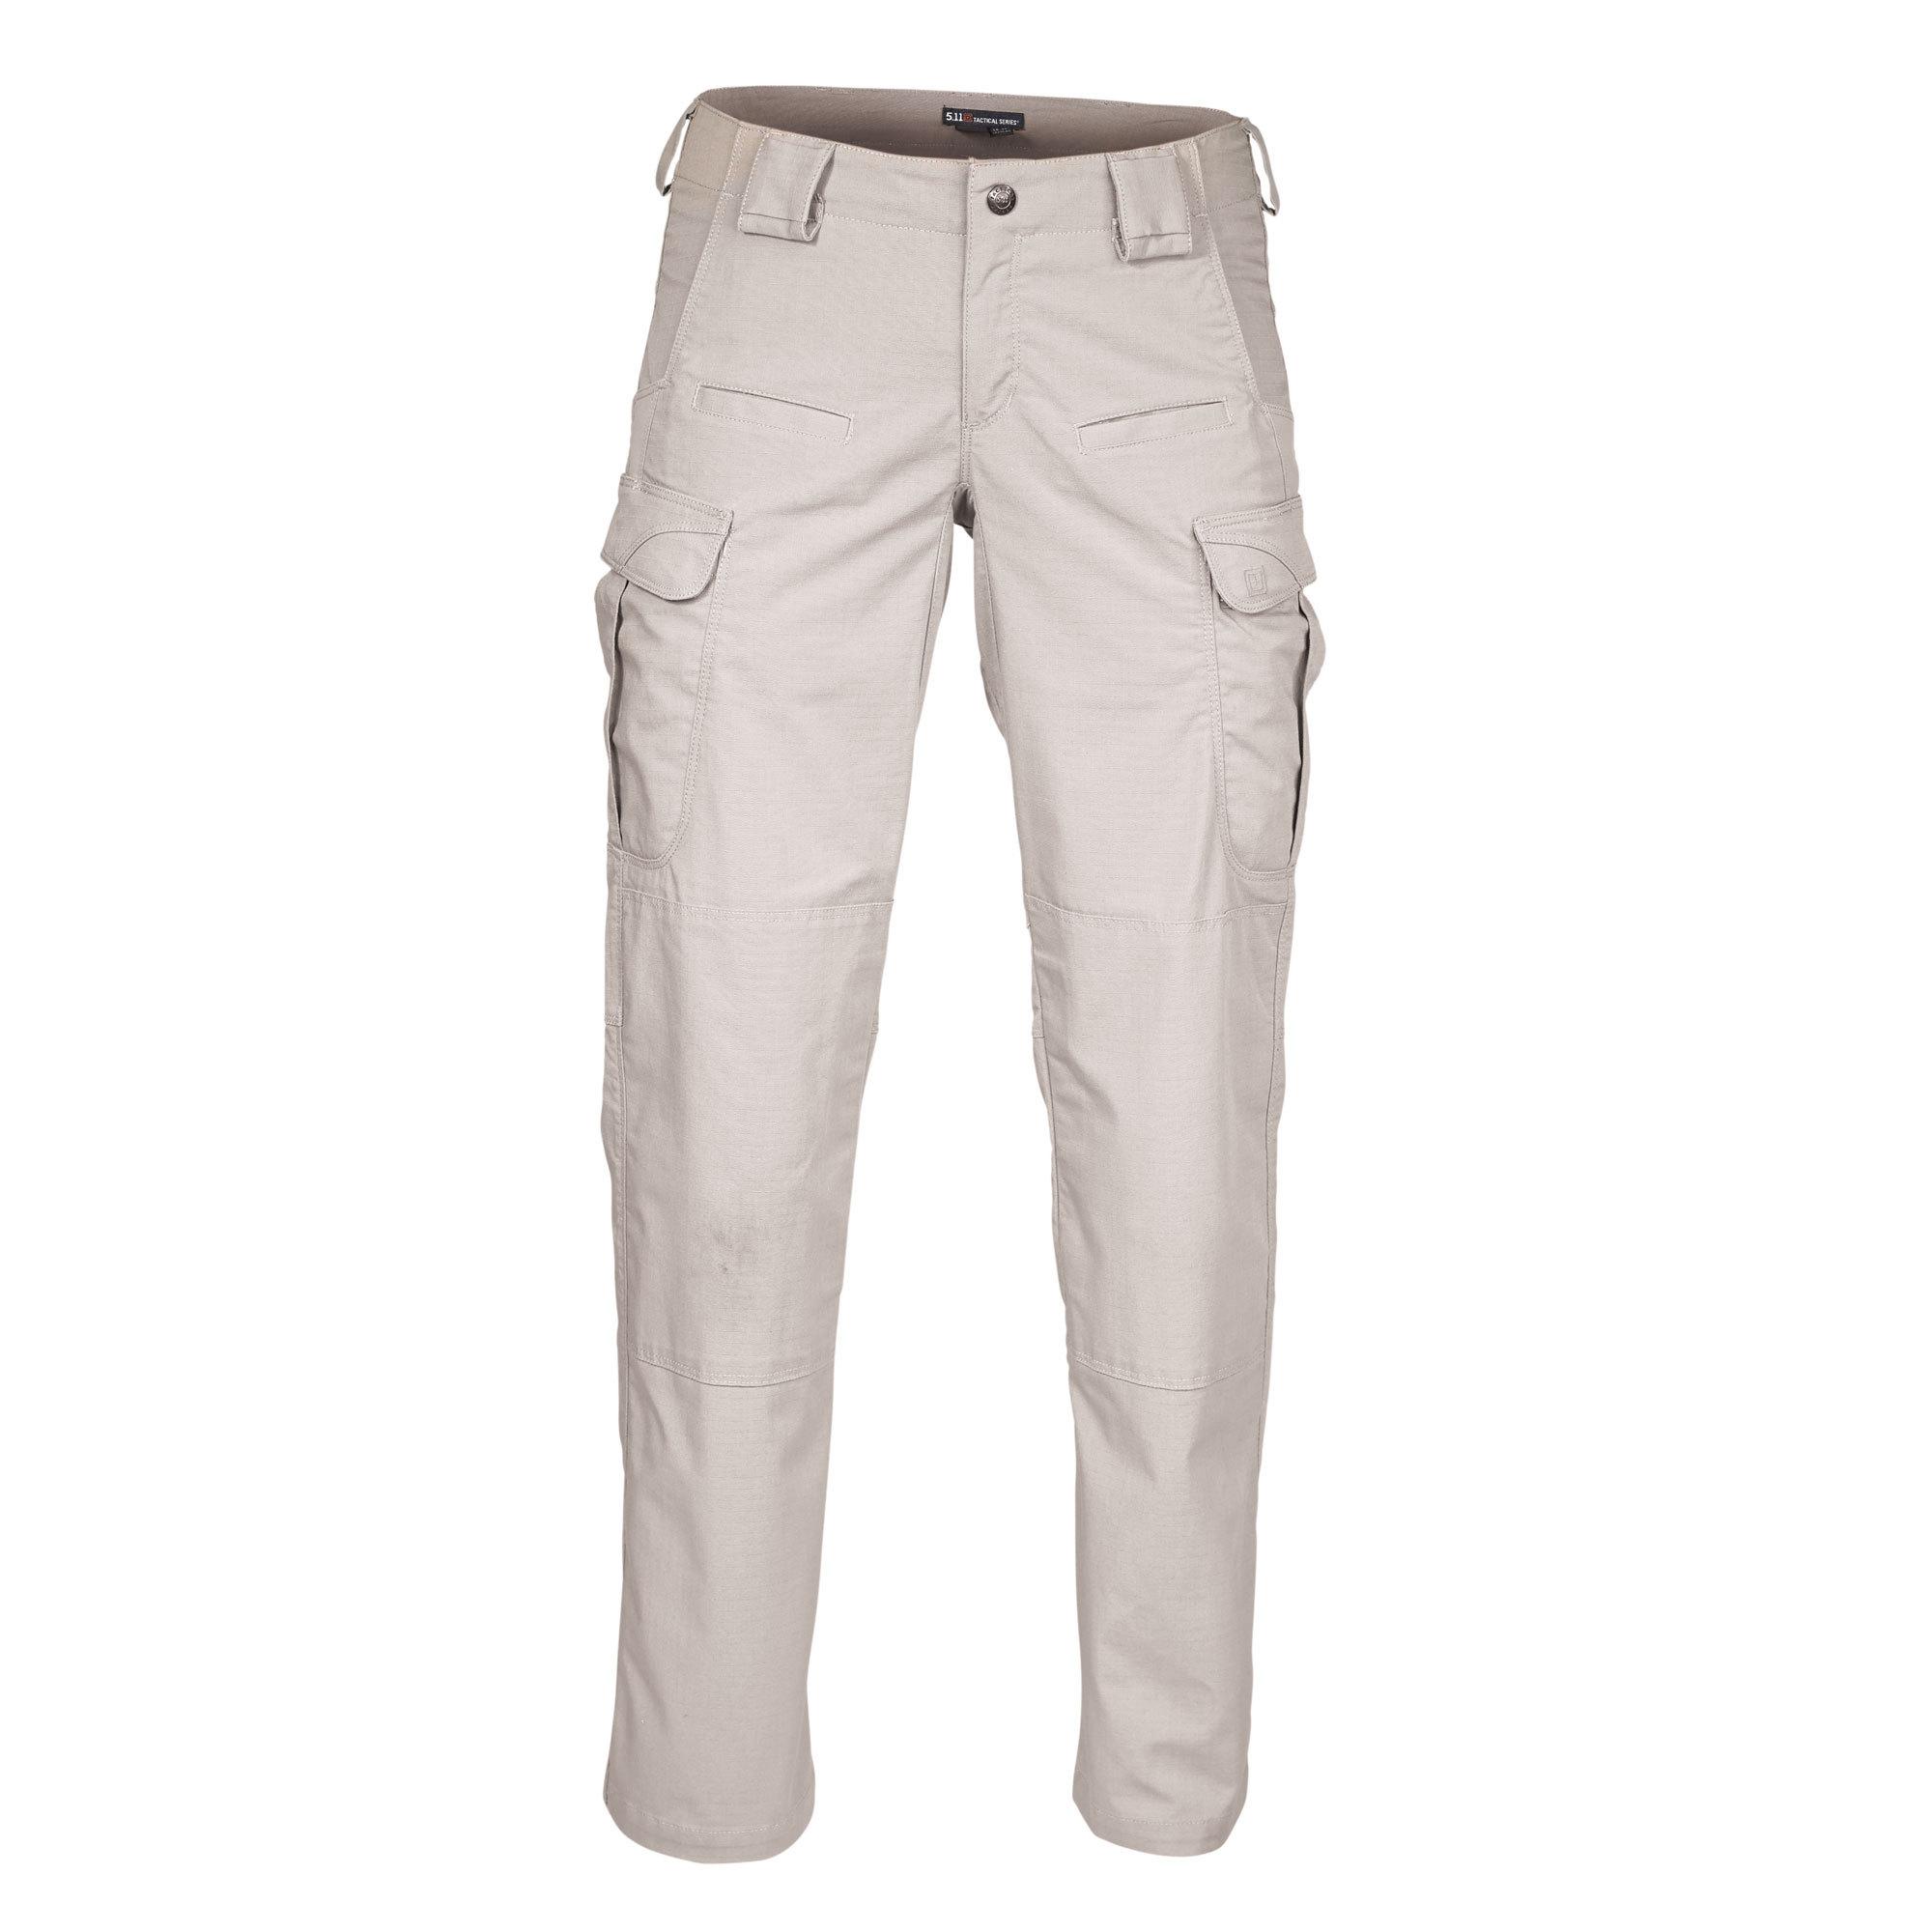 e88adbd5c133 Женские брюки Stryke pant 5.11